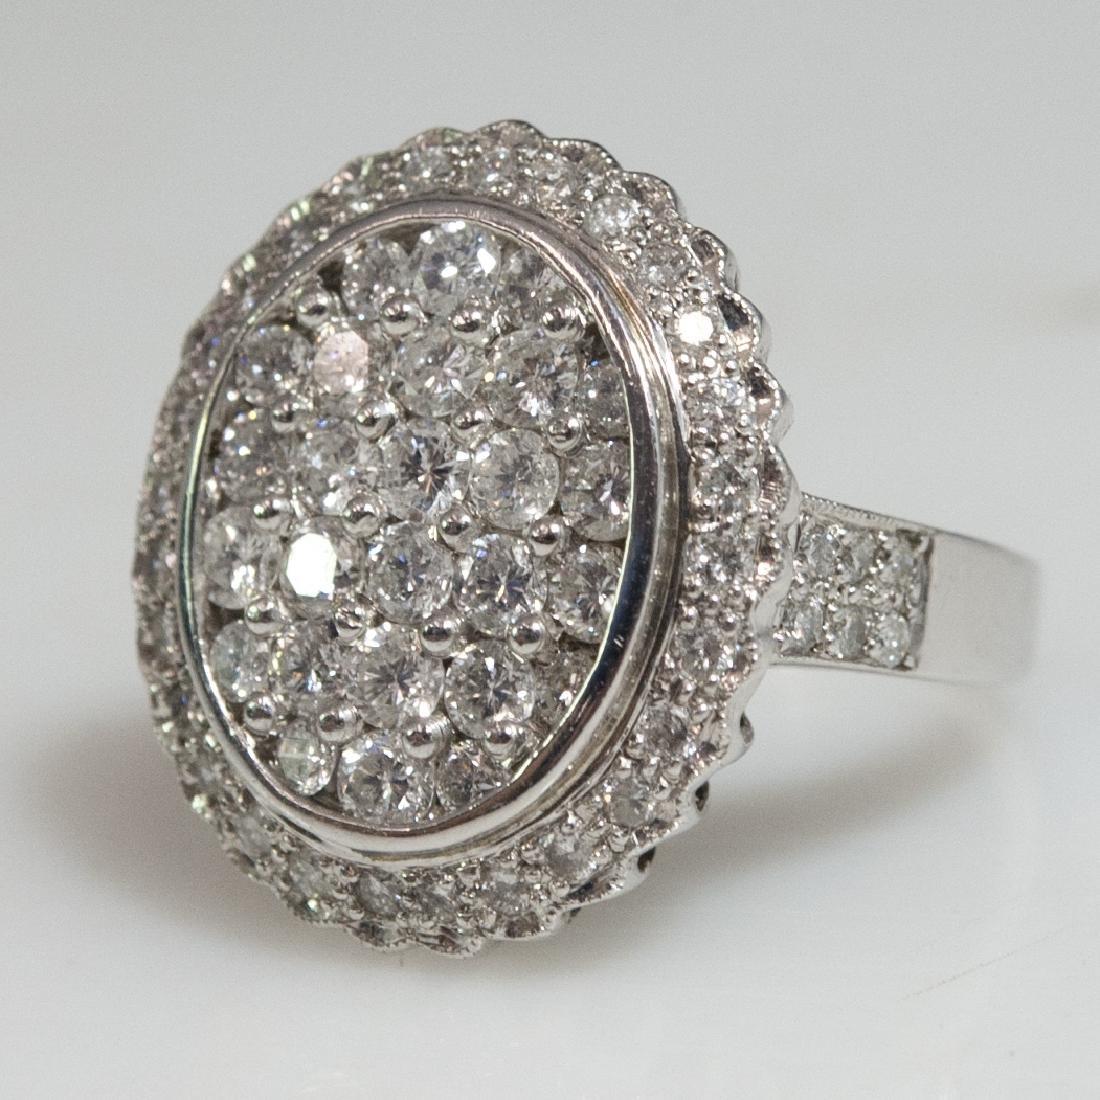 18kt Gold Diamond Ladies Ring - 2